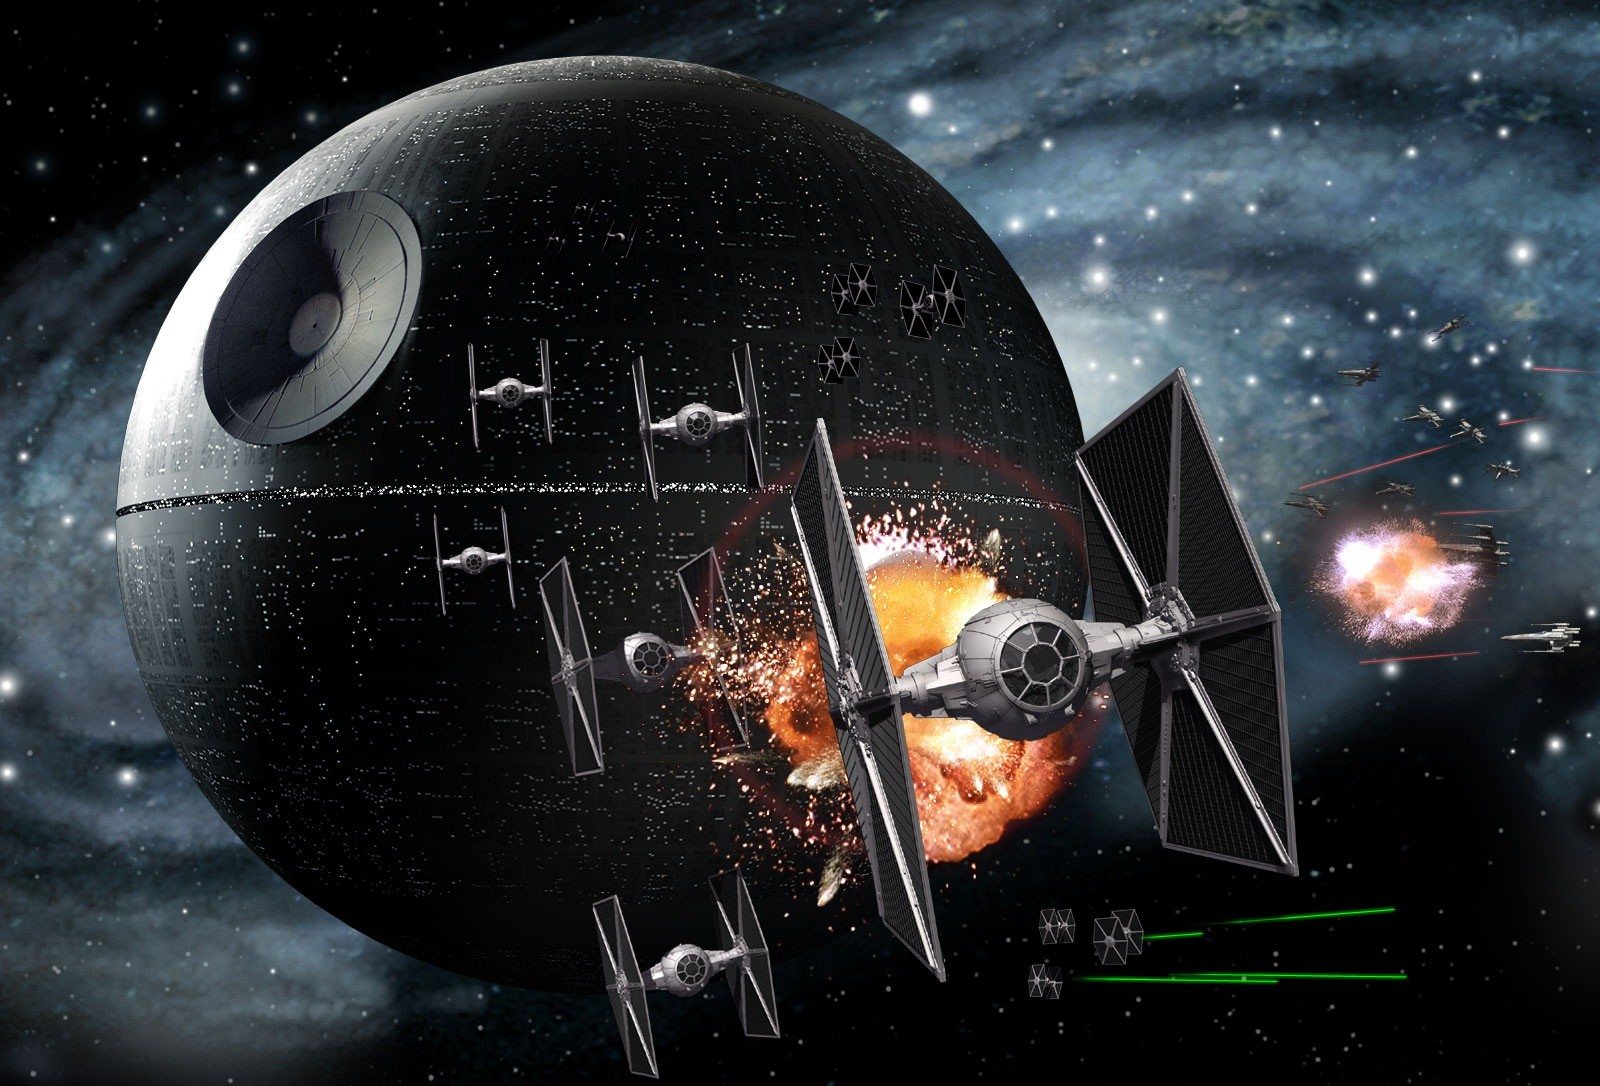 Star Wars HD Desktop Wallpapers   New HD Wallpapers 1600x1086